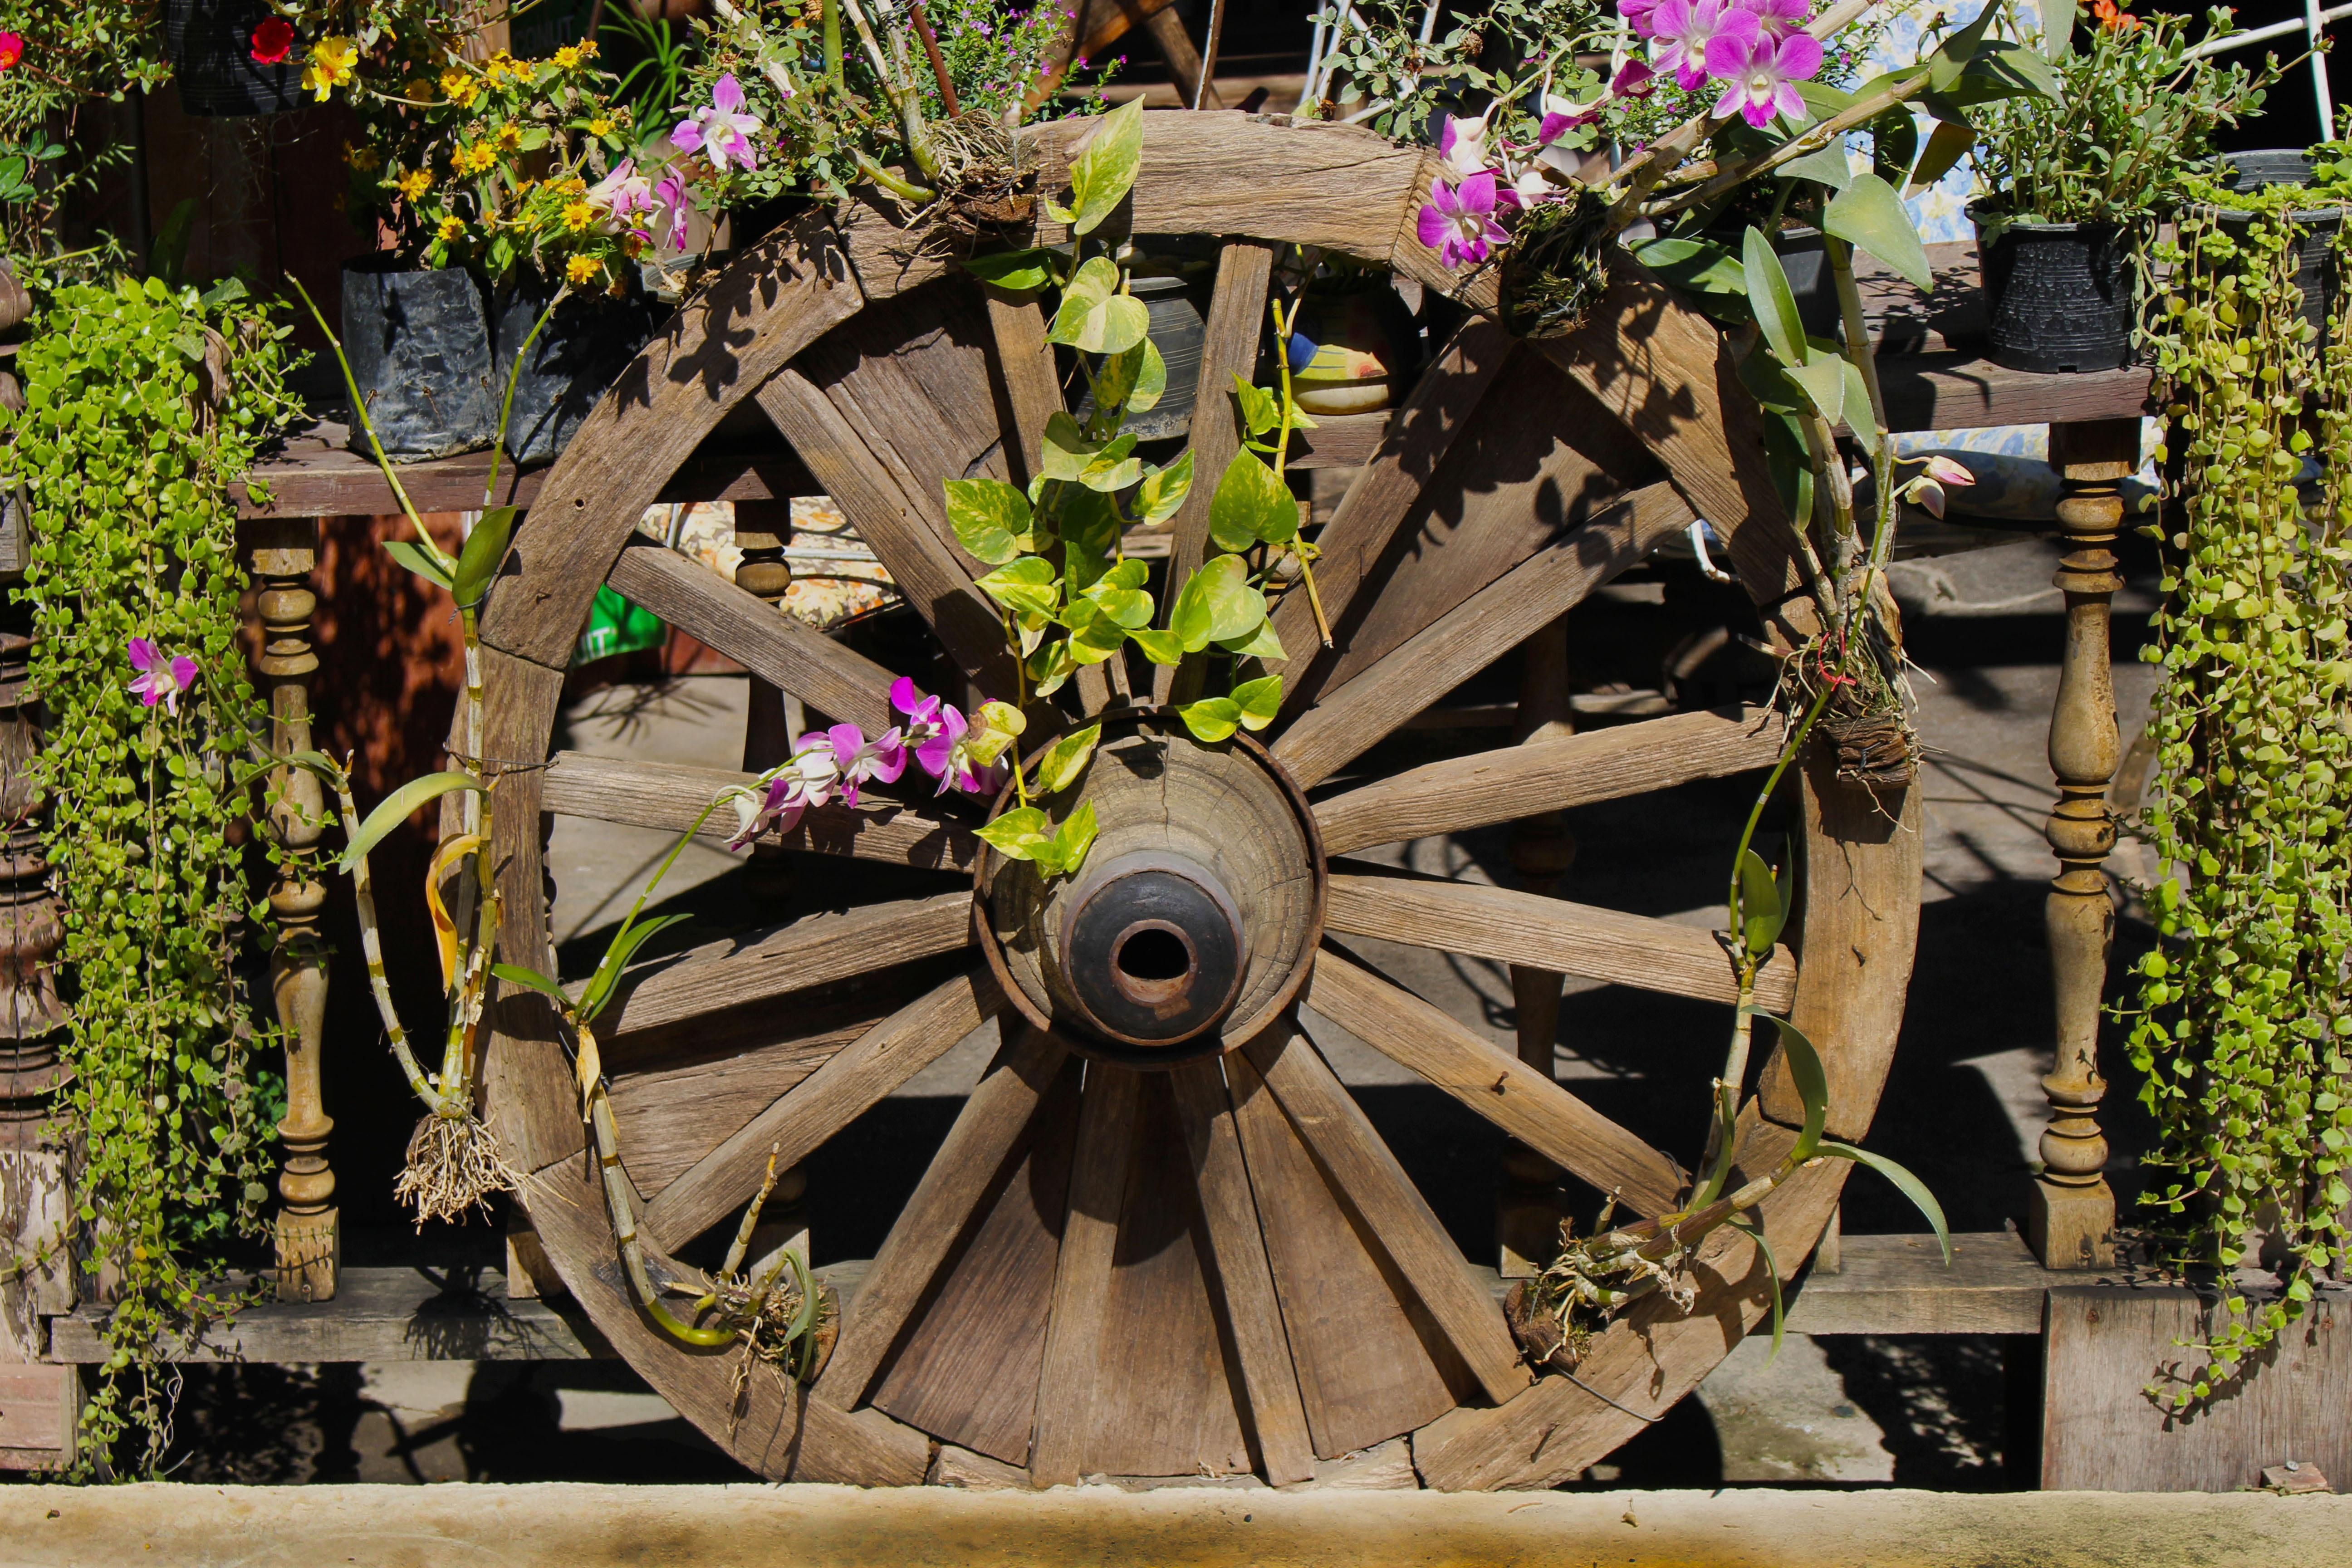 Free Images : wood, farm, vintage, antique, retro, round, flower ...